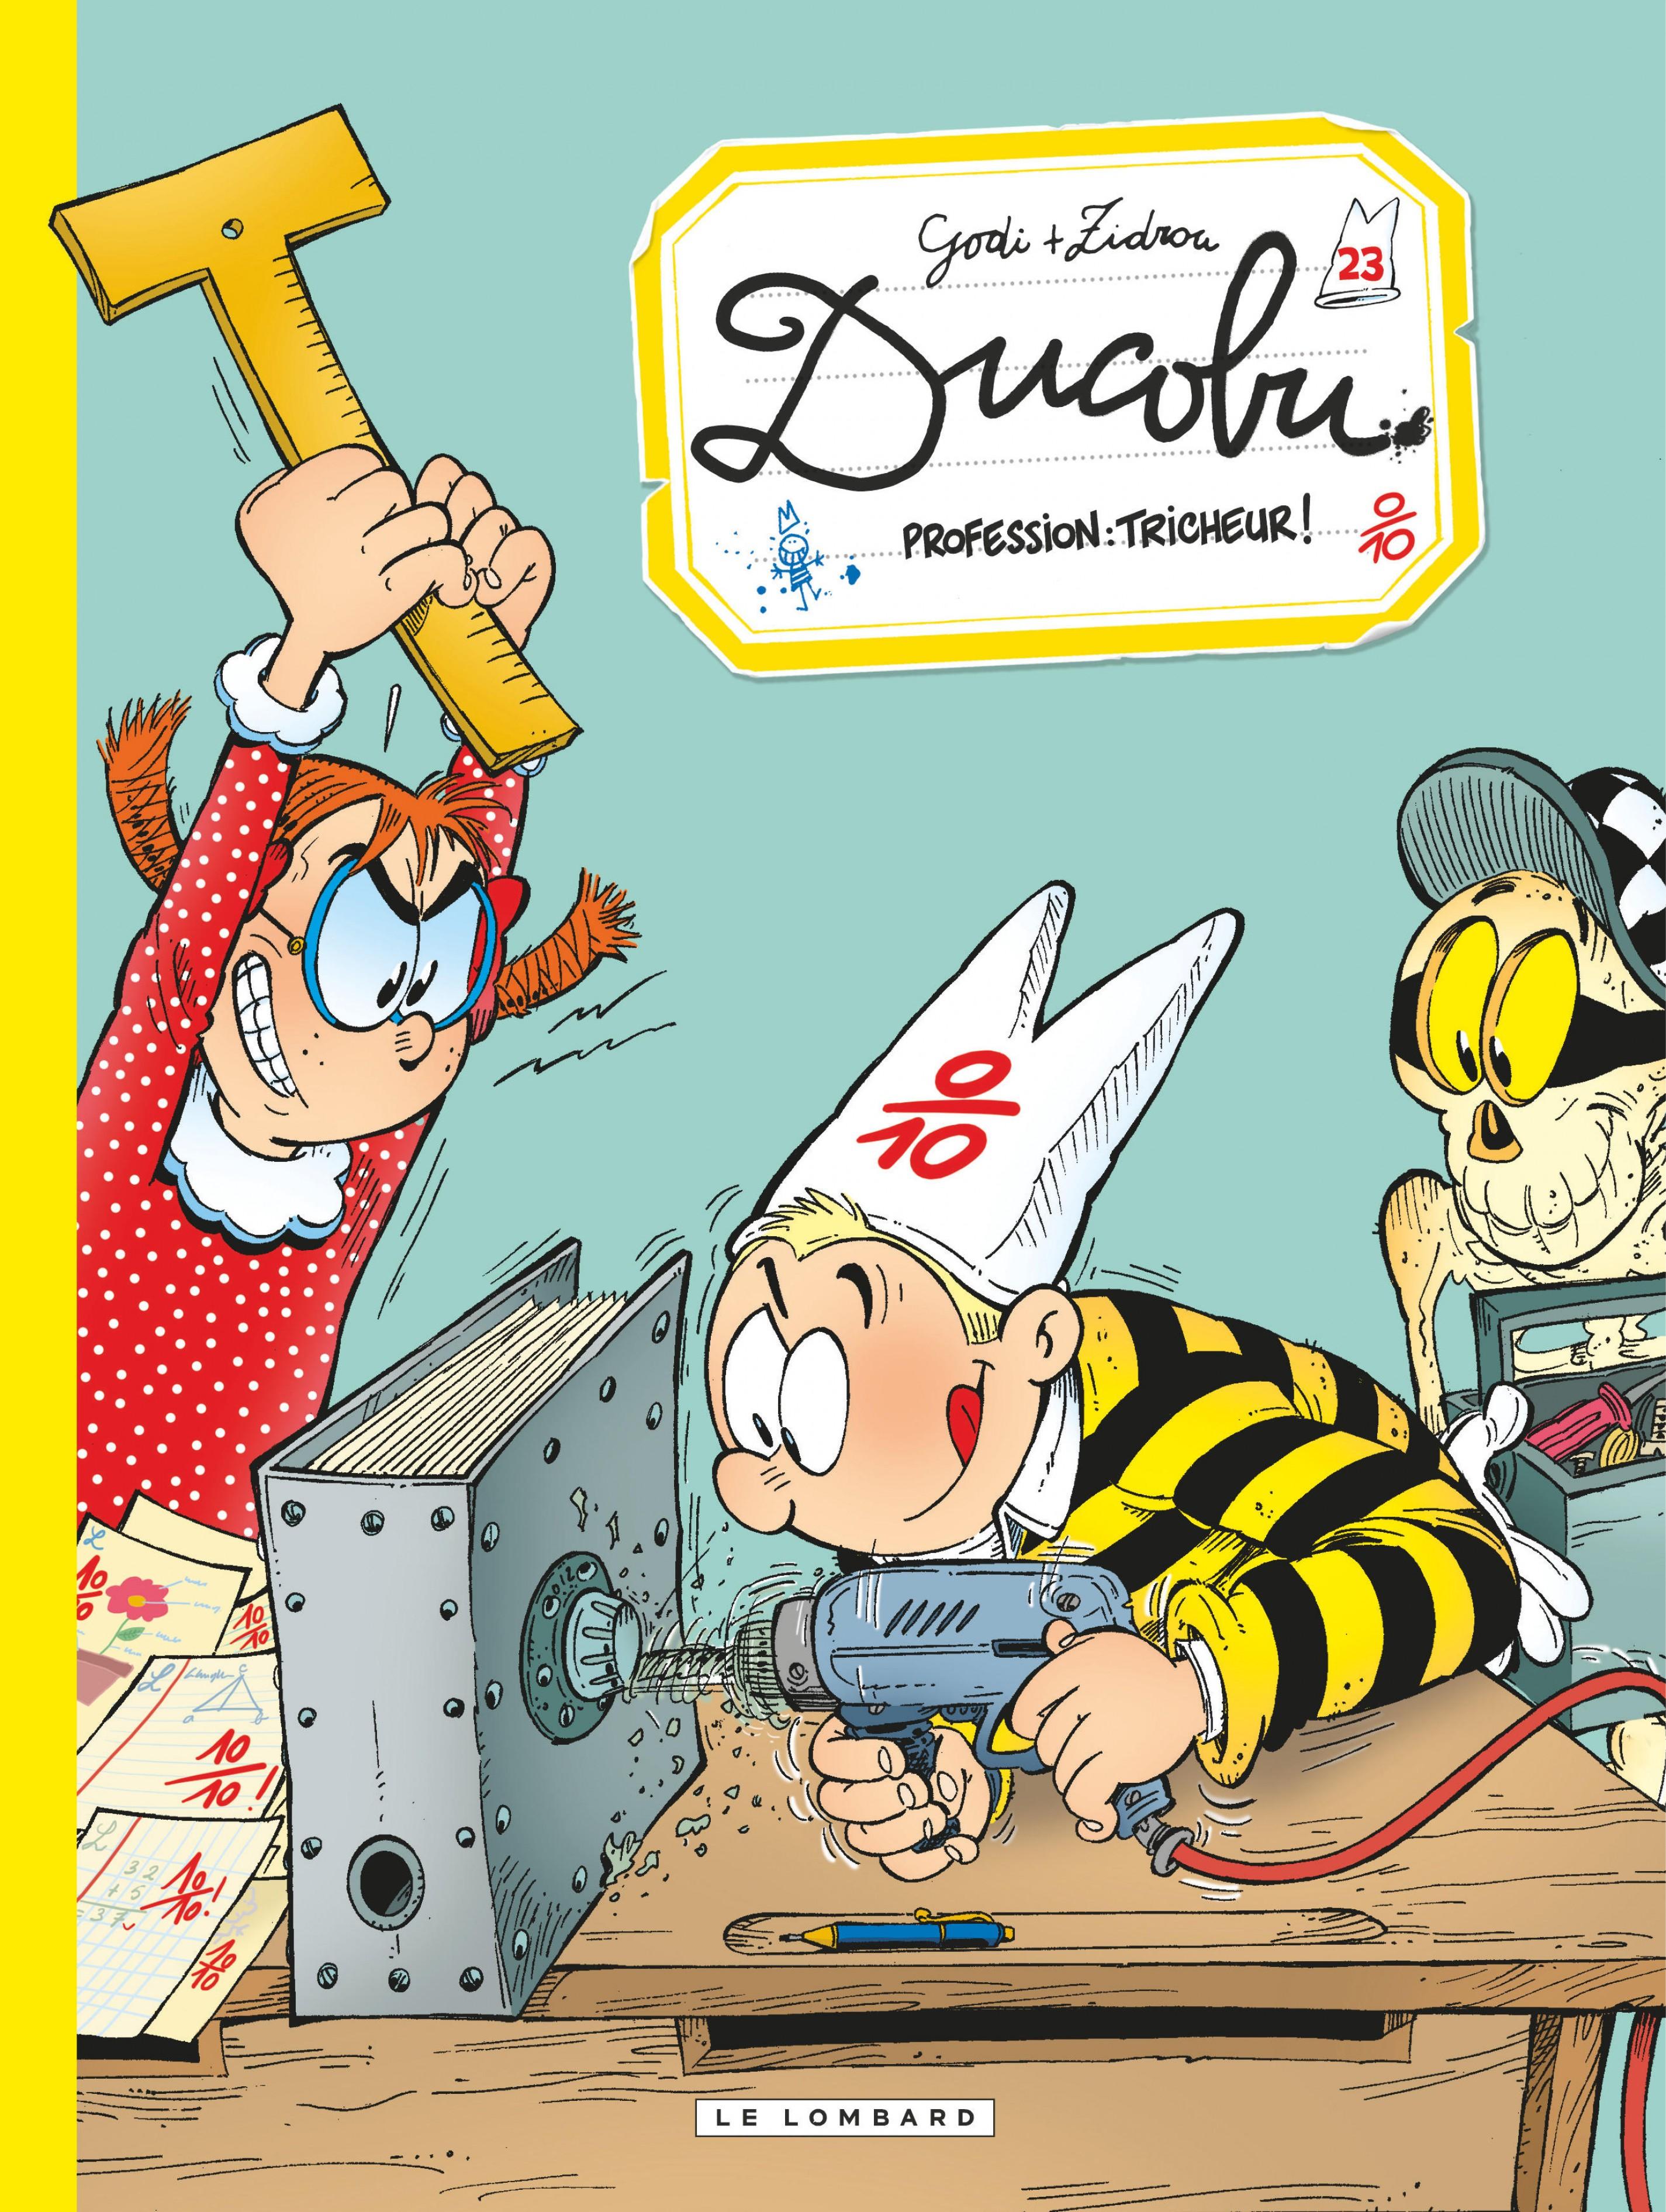 Ducobu - Tome 23 - Profession: tricheur! |